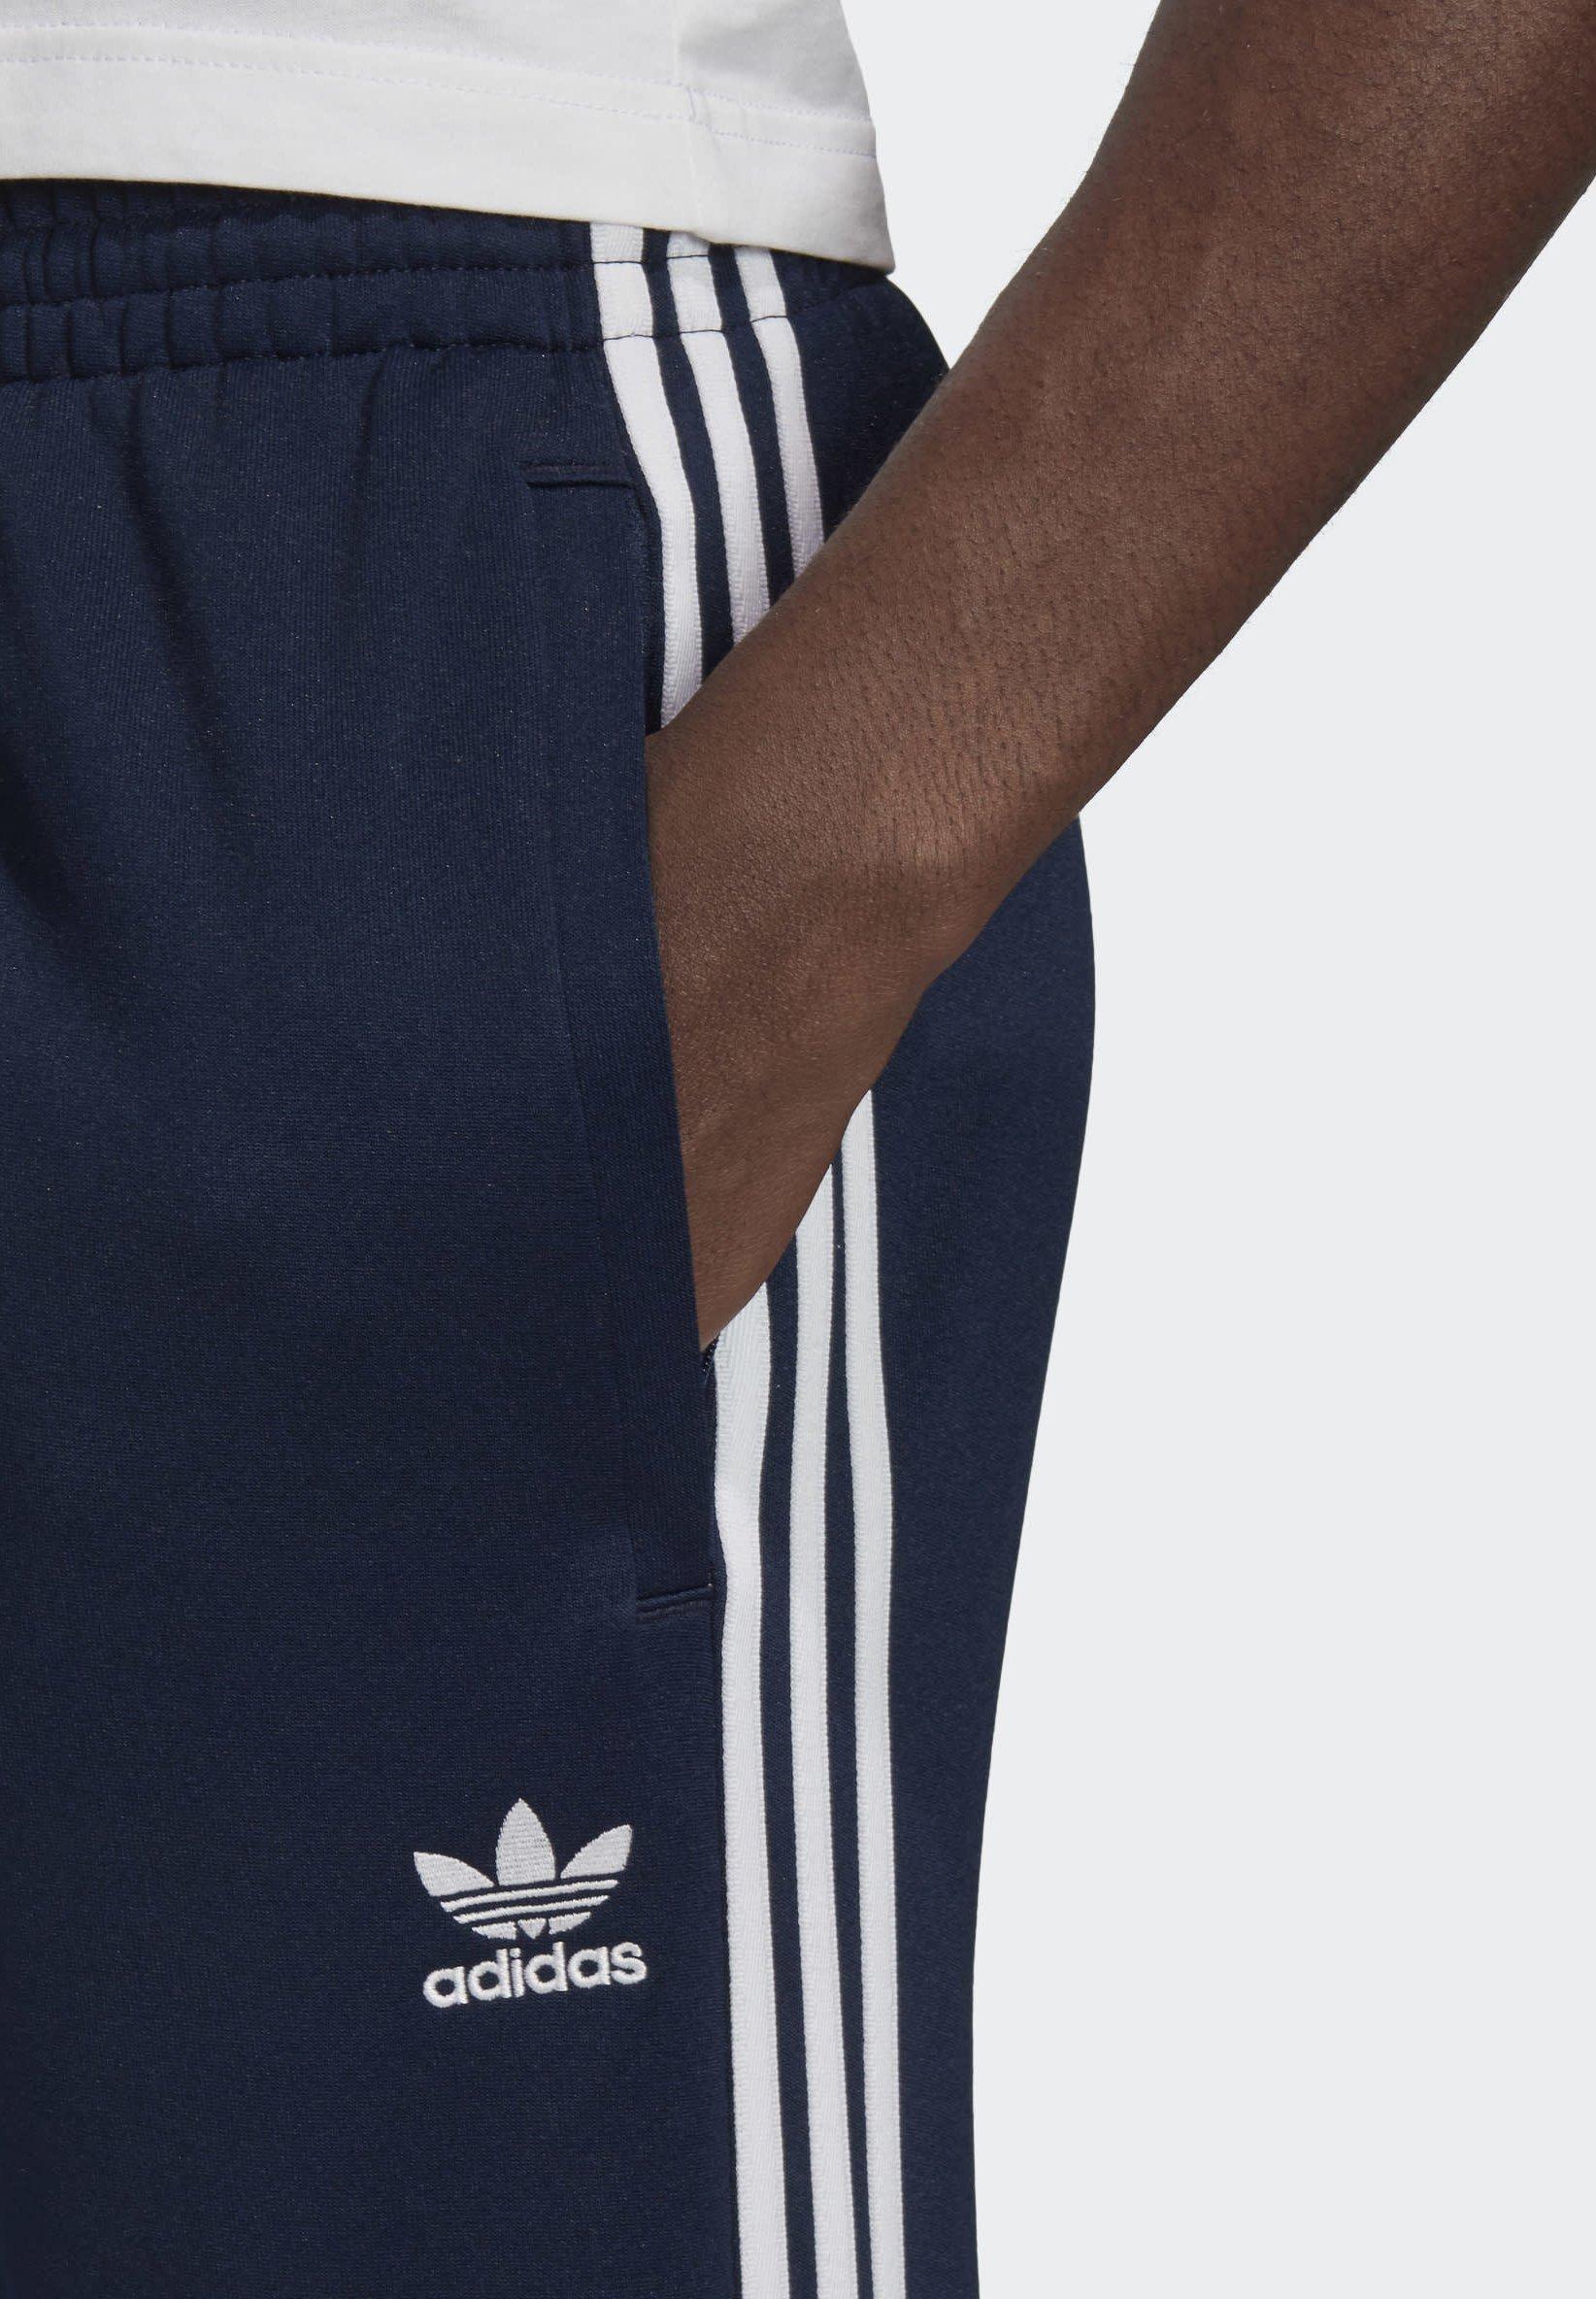 adidas Originals ADICOLOR CLASSICS PRIMEBLUE SST TRACKSUIT BOTTOM - Tracksuit bottoms - blue GsYF9